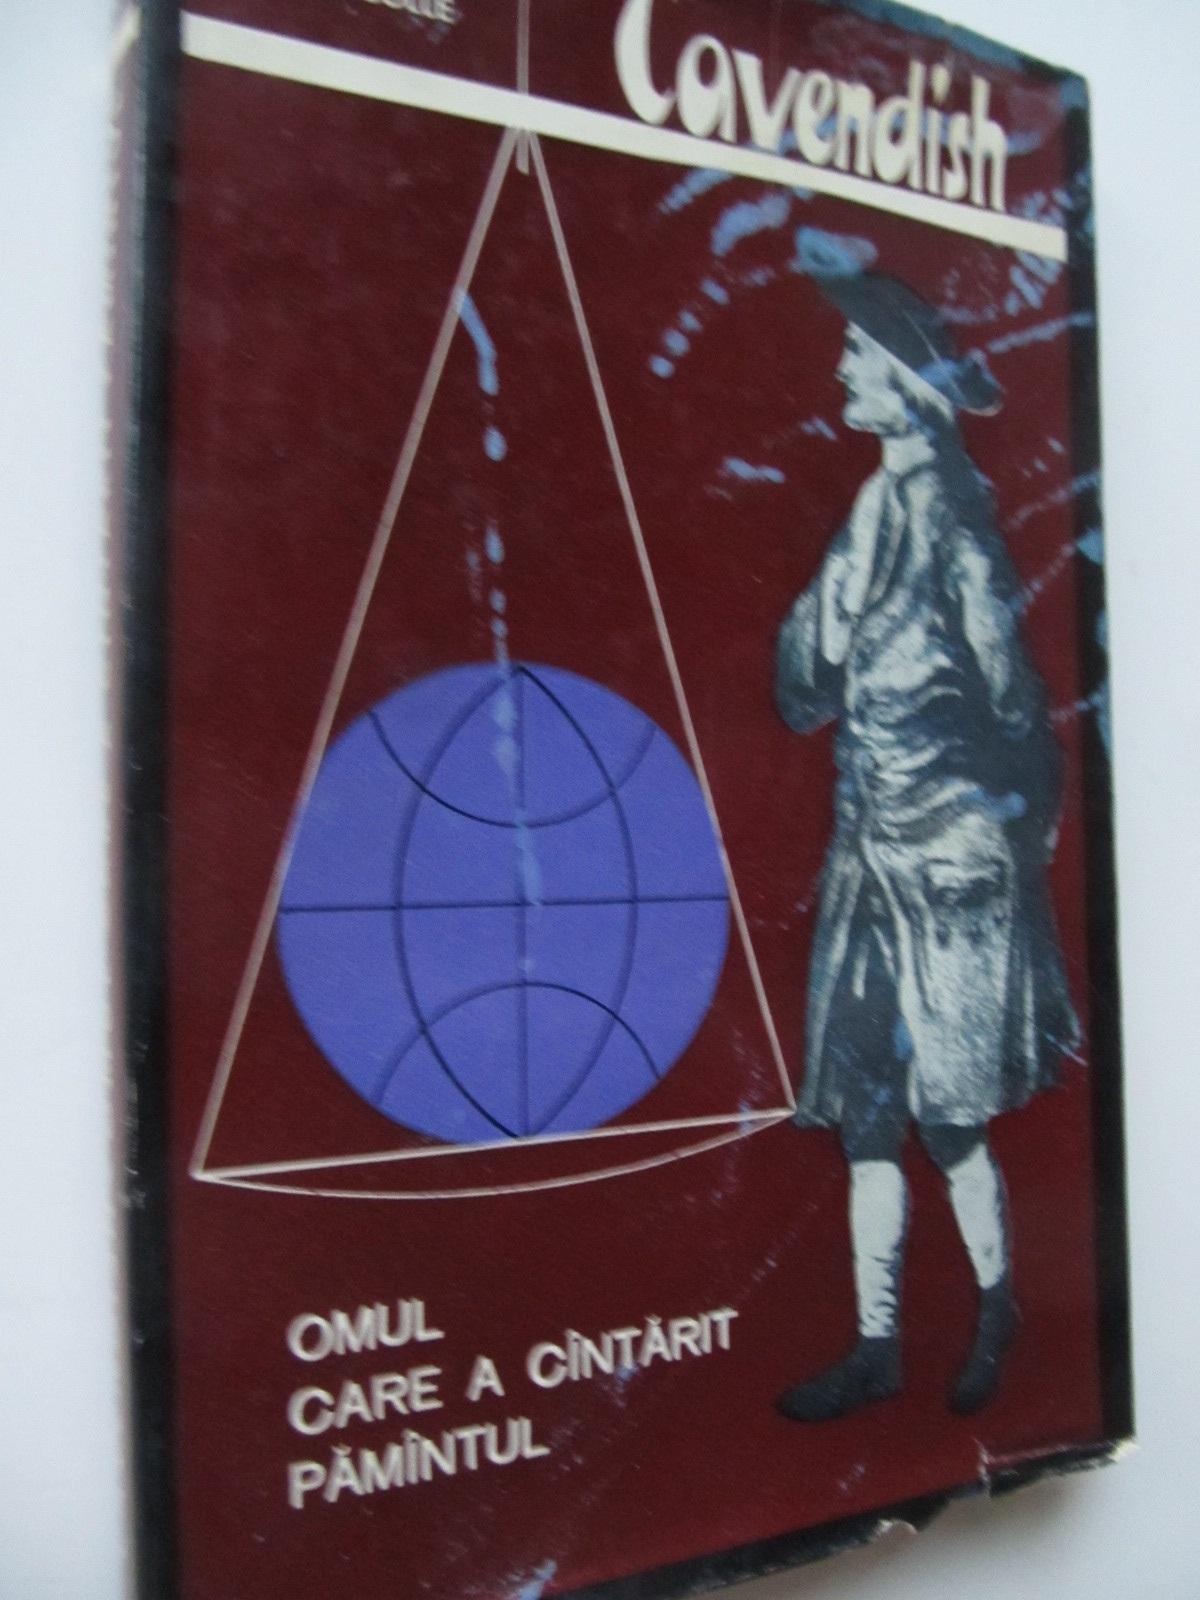 Cavendish - Omul care a cantarit pamantul - P. Lepine , J. Nicolle | Detalii carte